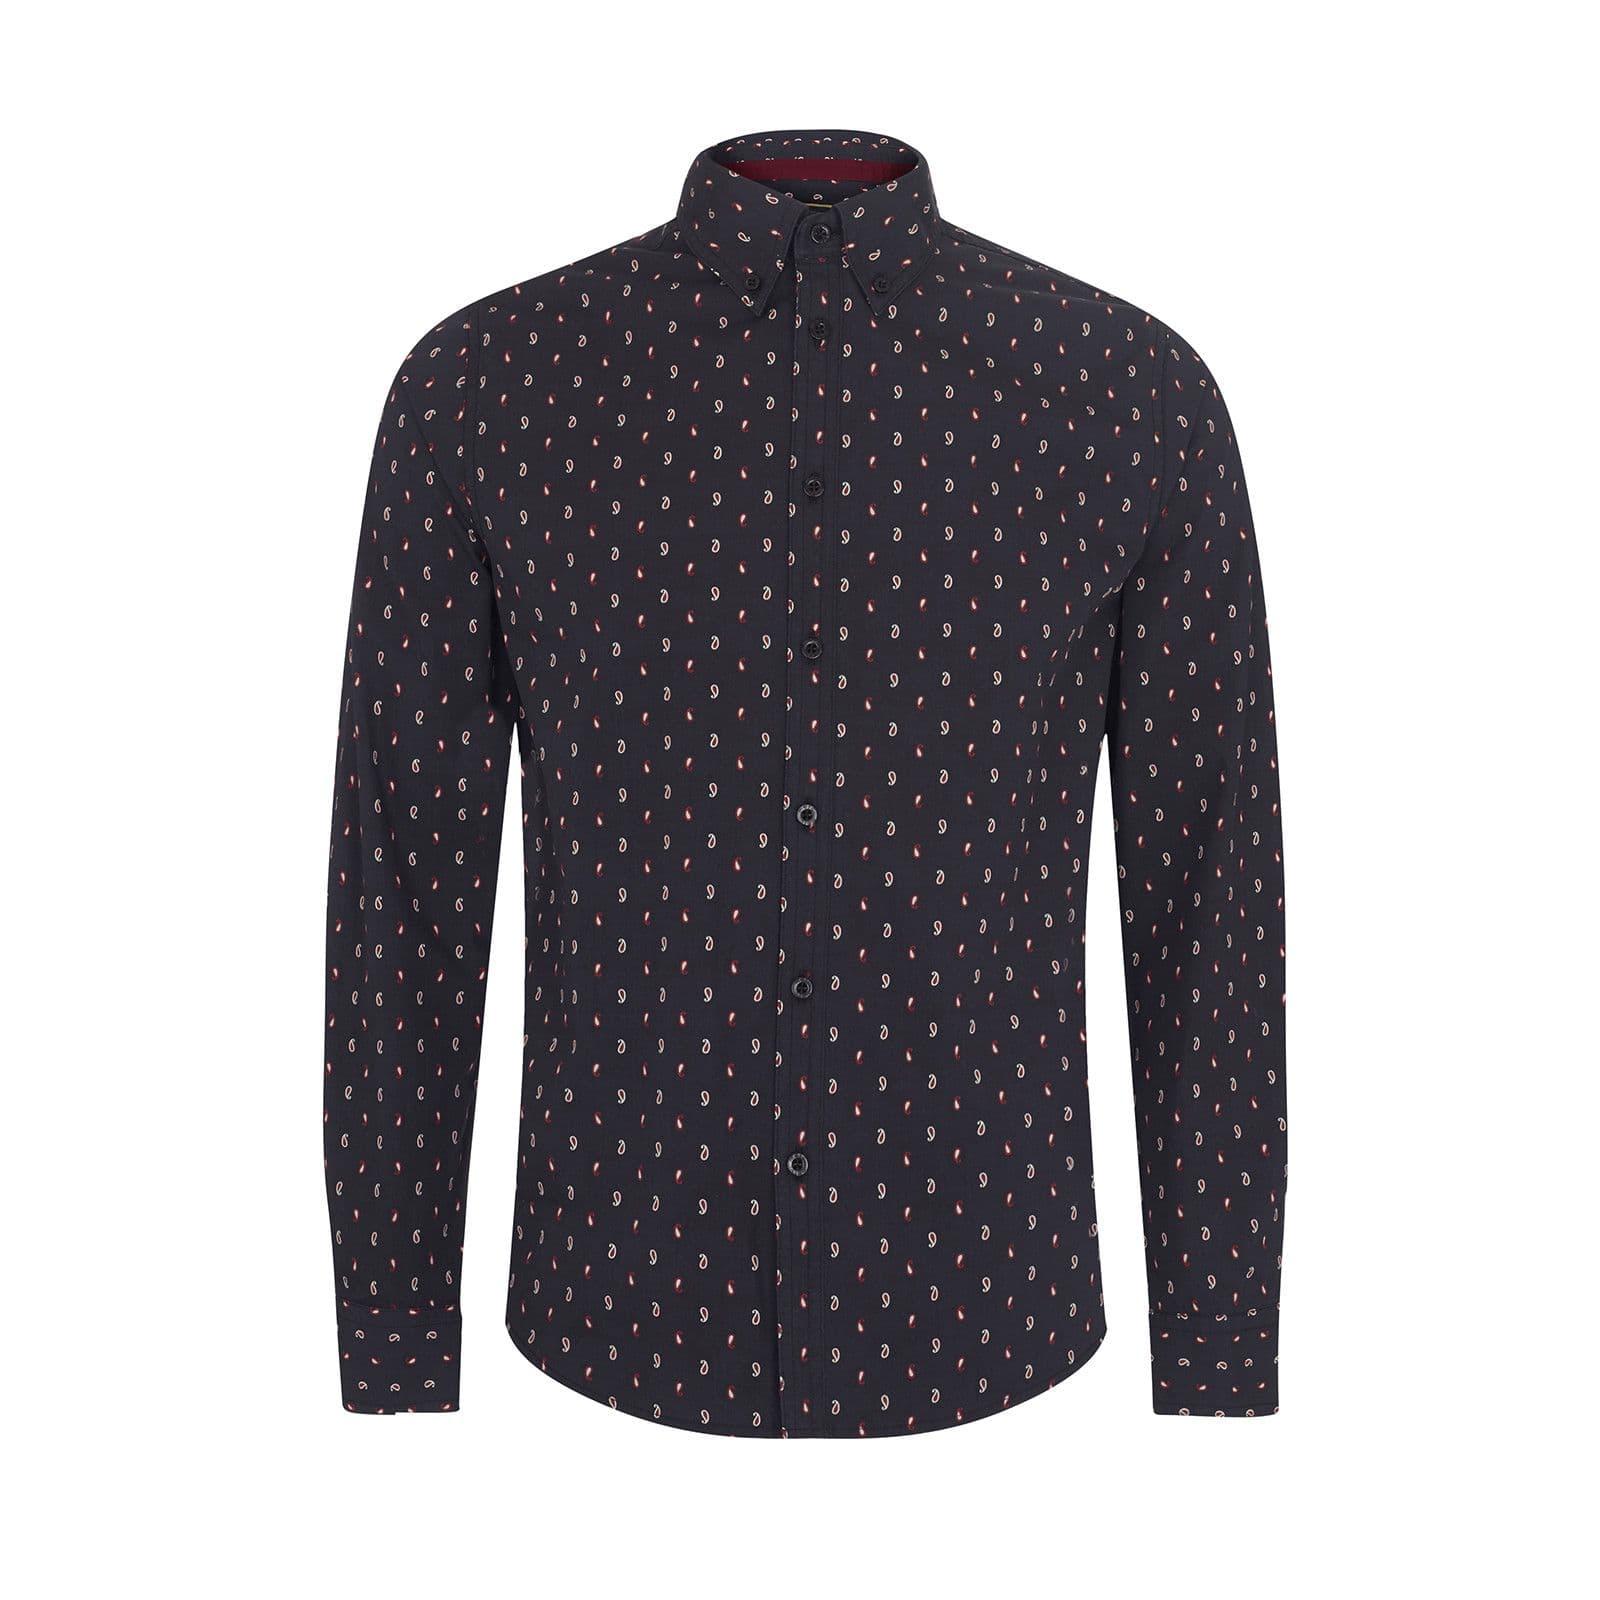 Рубашка HobartРубашки под заказ<br><br><br>Артикул: 1517202<br>Материал: 100% хлопок<br>Цвет: черный<br>Пол: Мужской